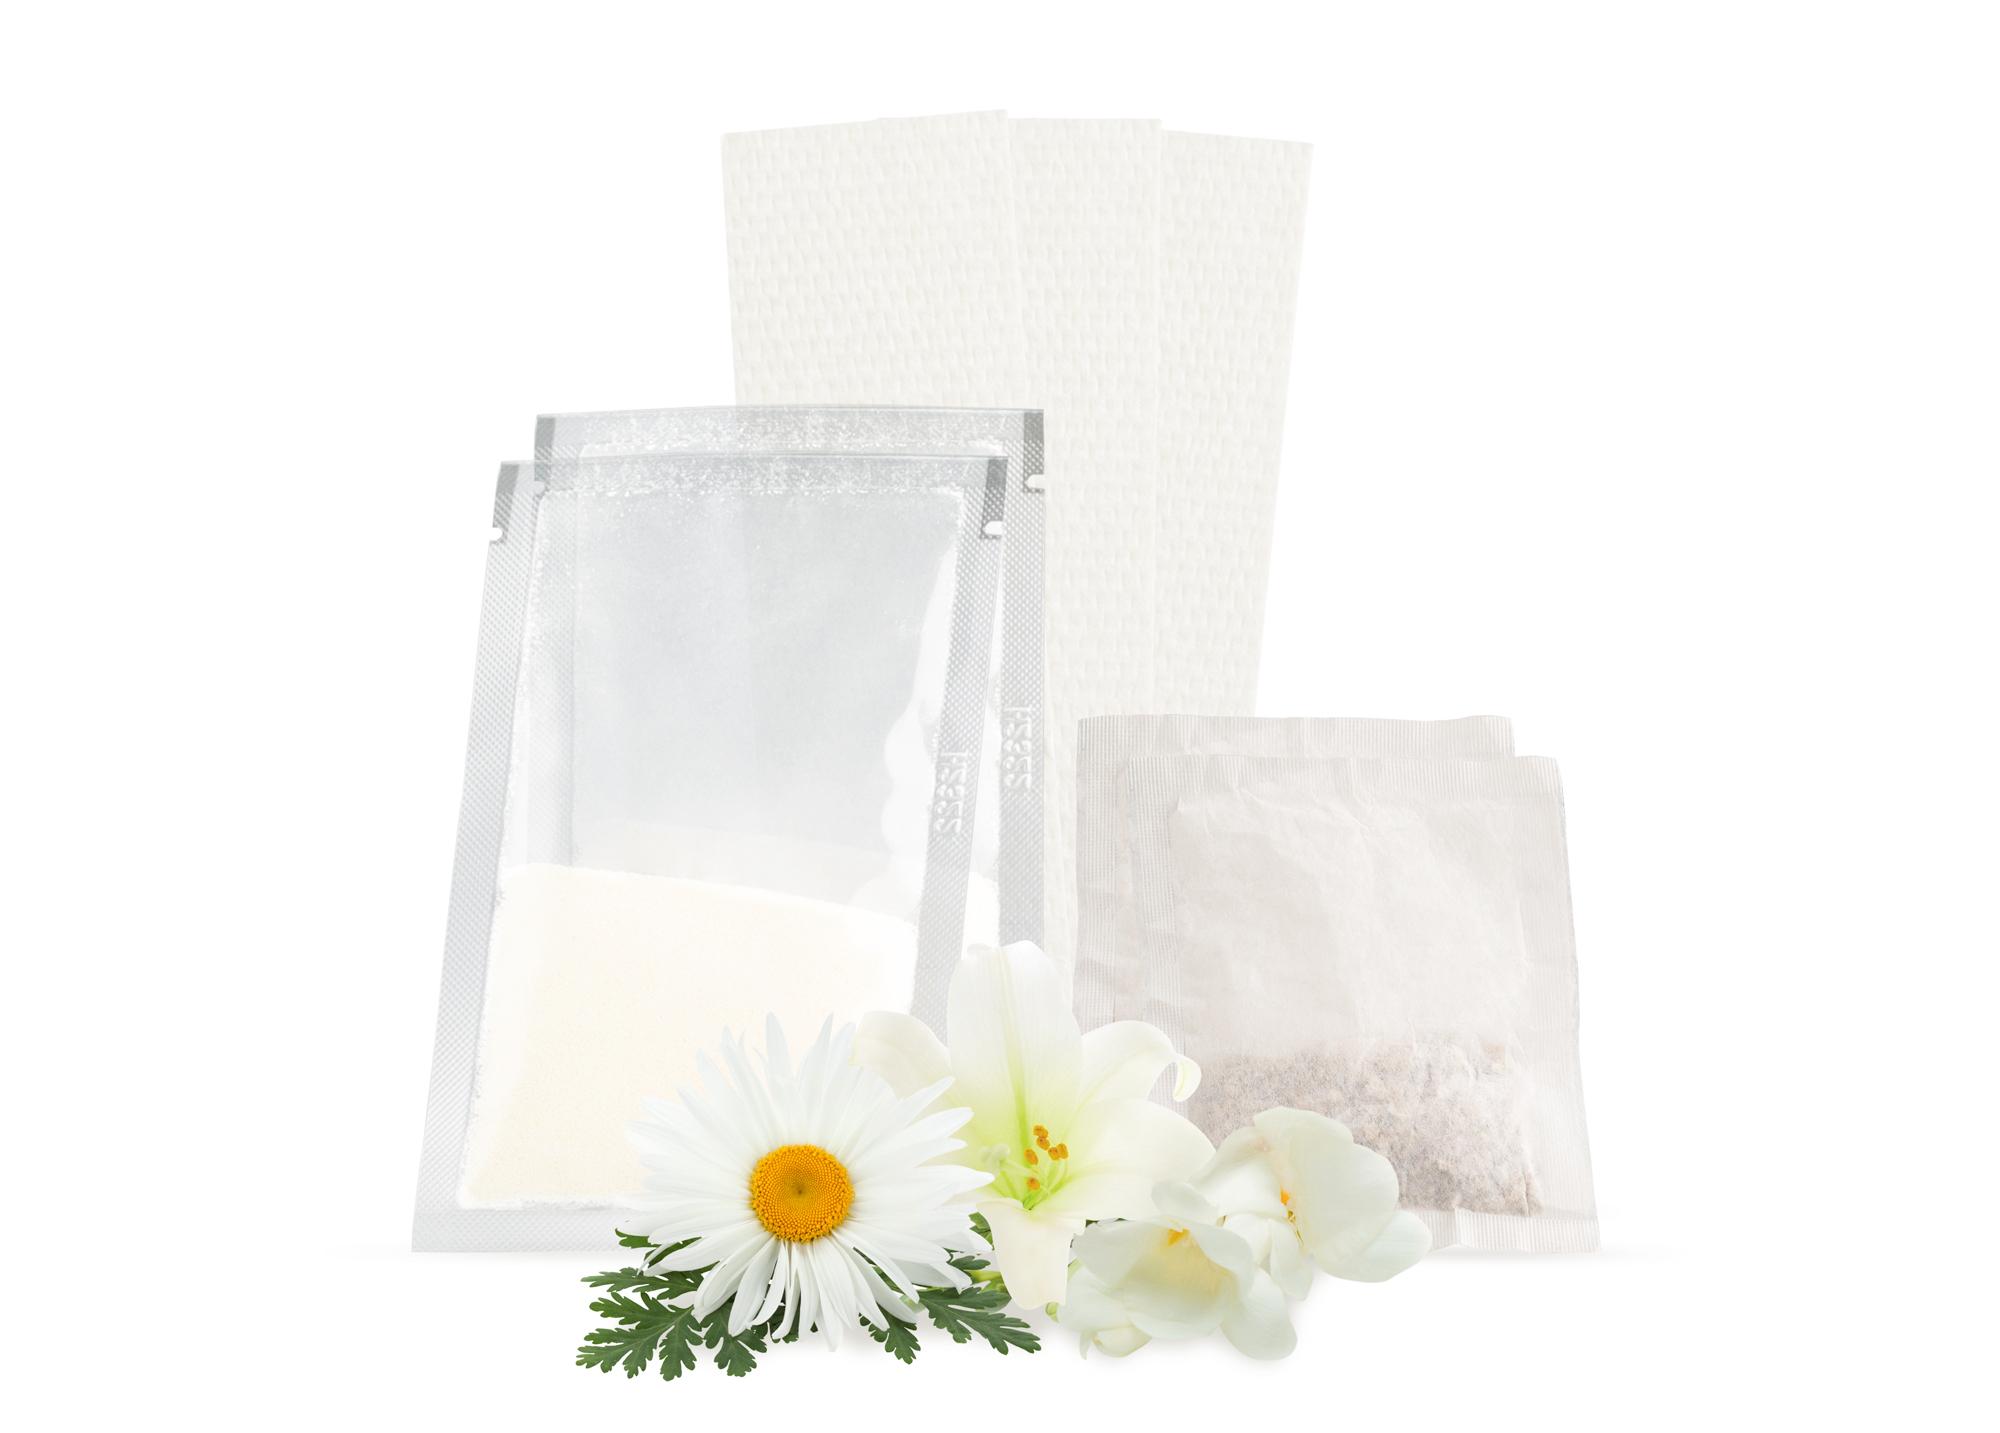 Biosan - Product range